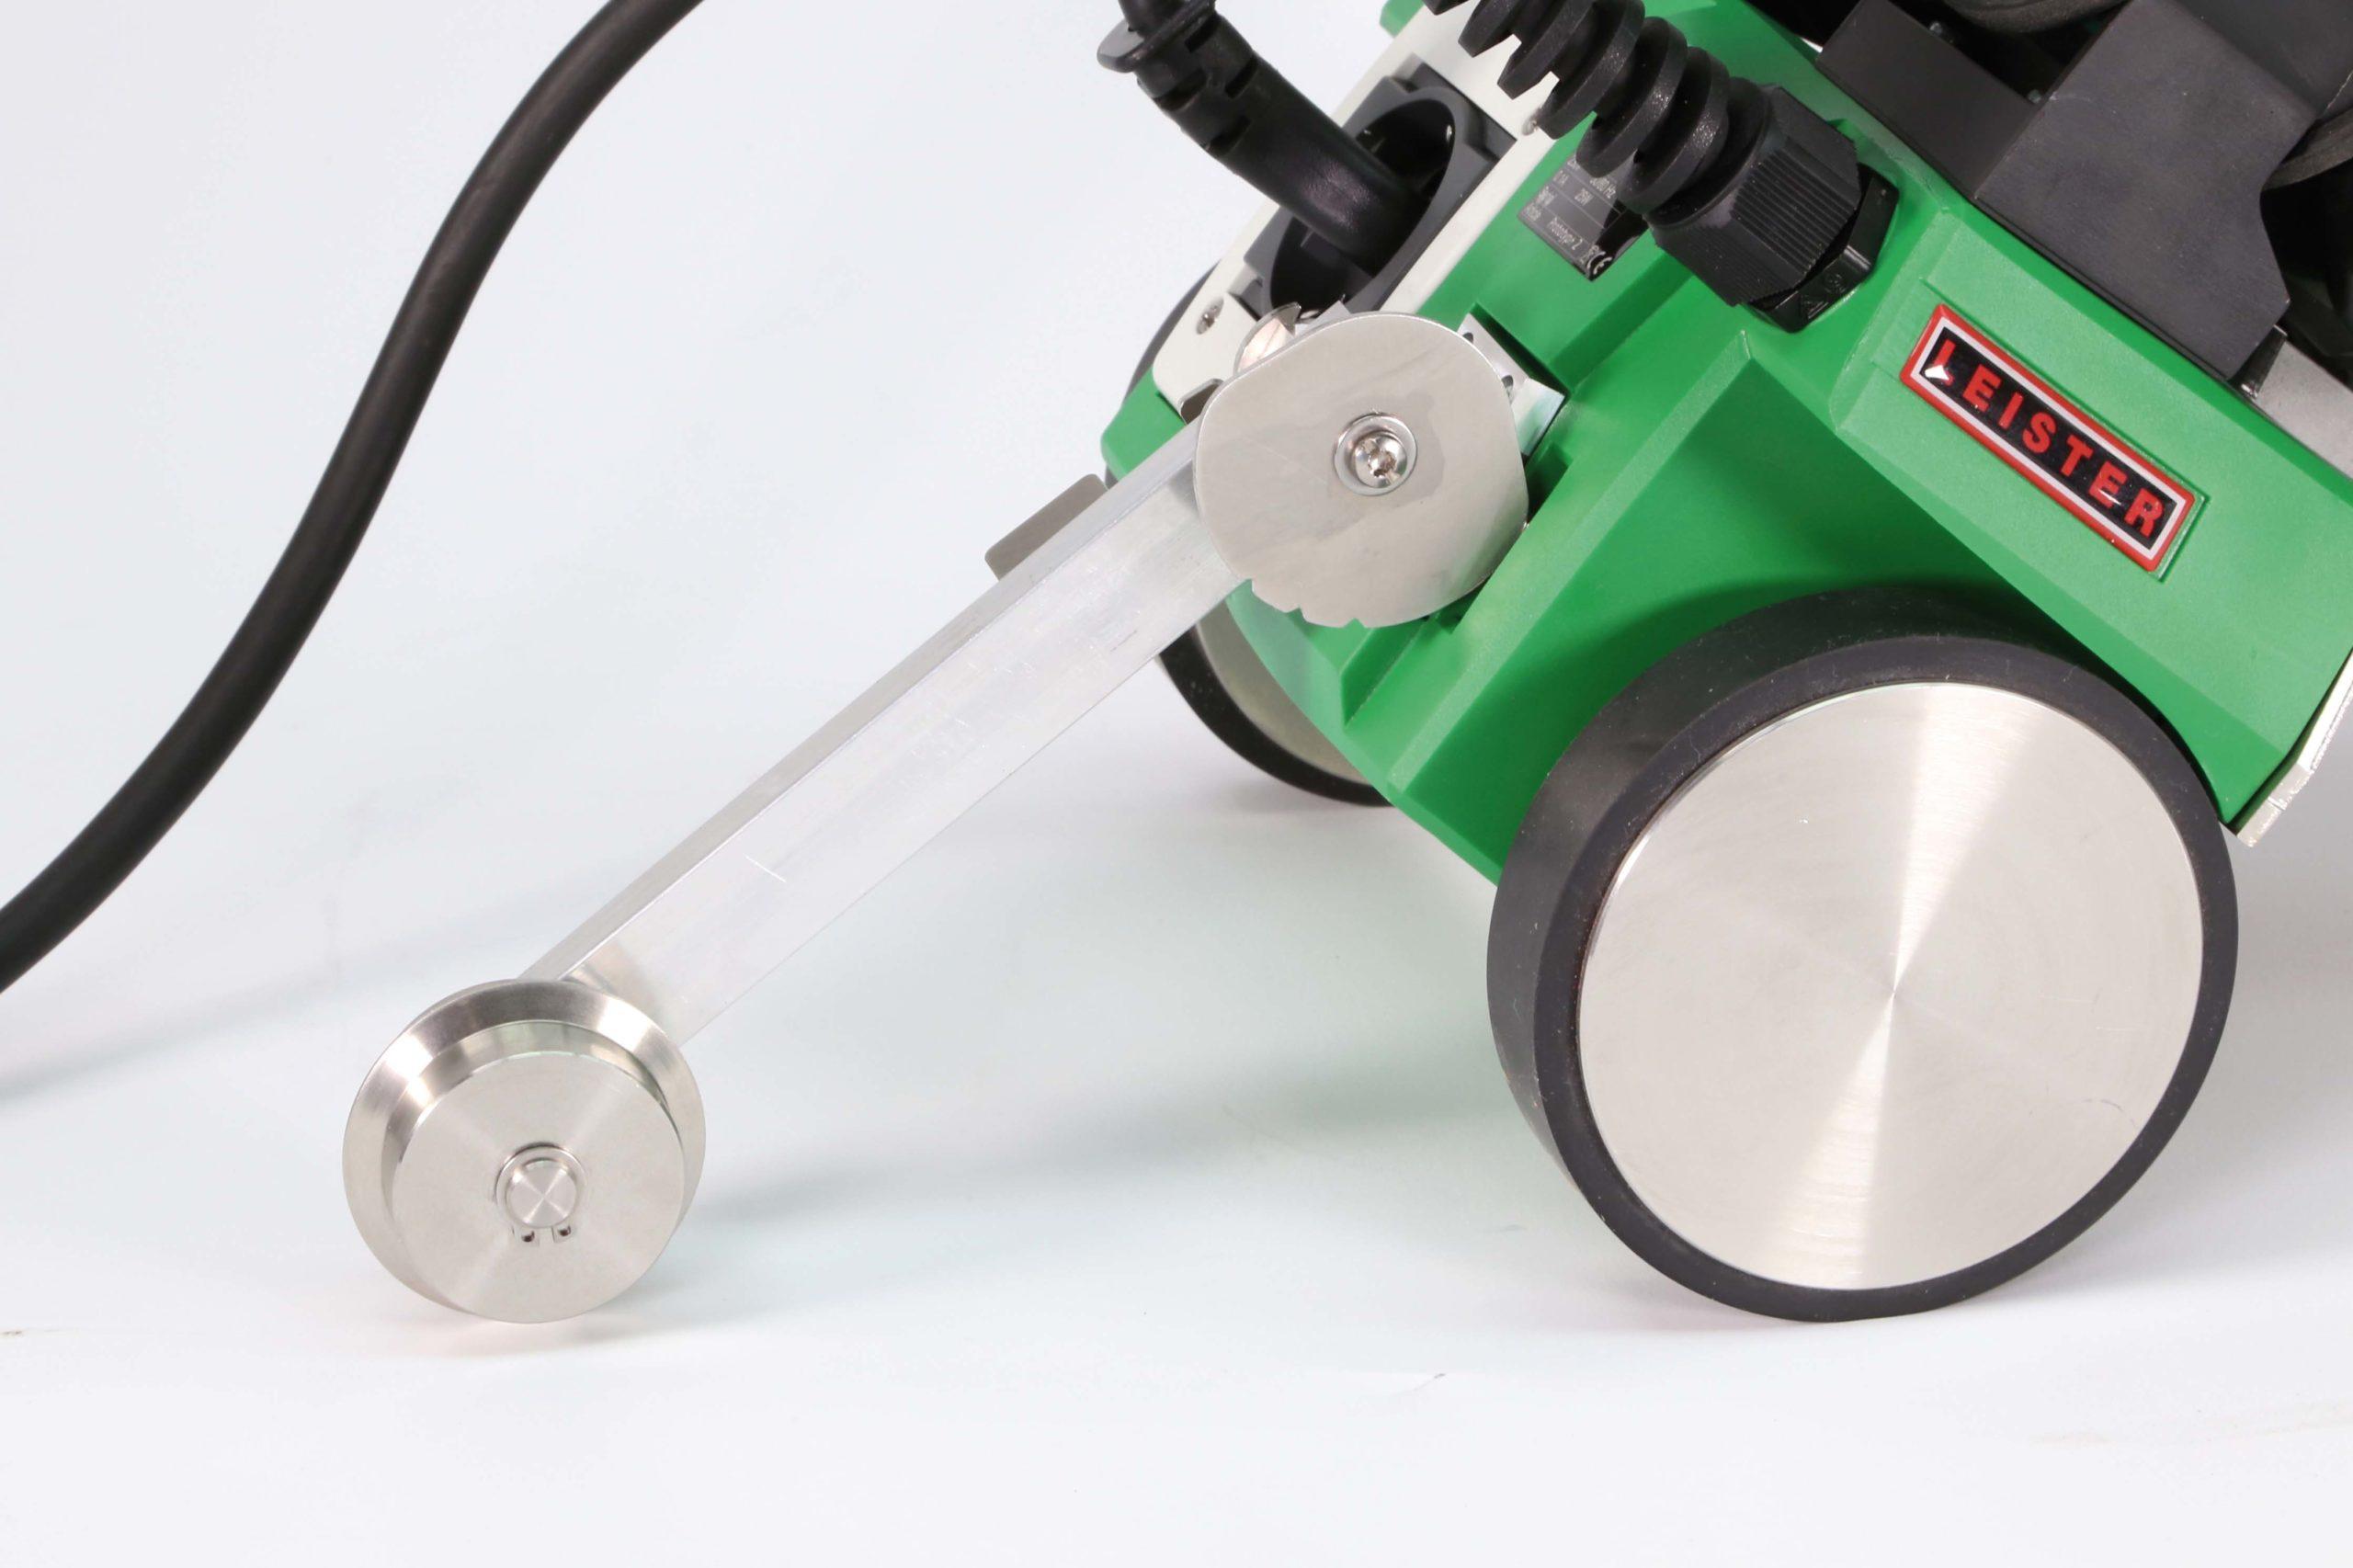 Leister Minifloor rolka prowadząca